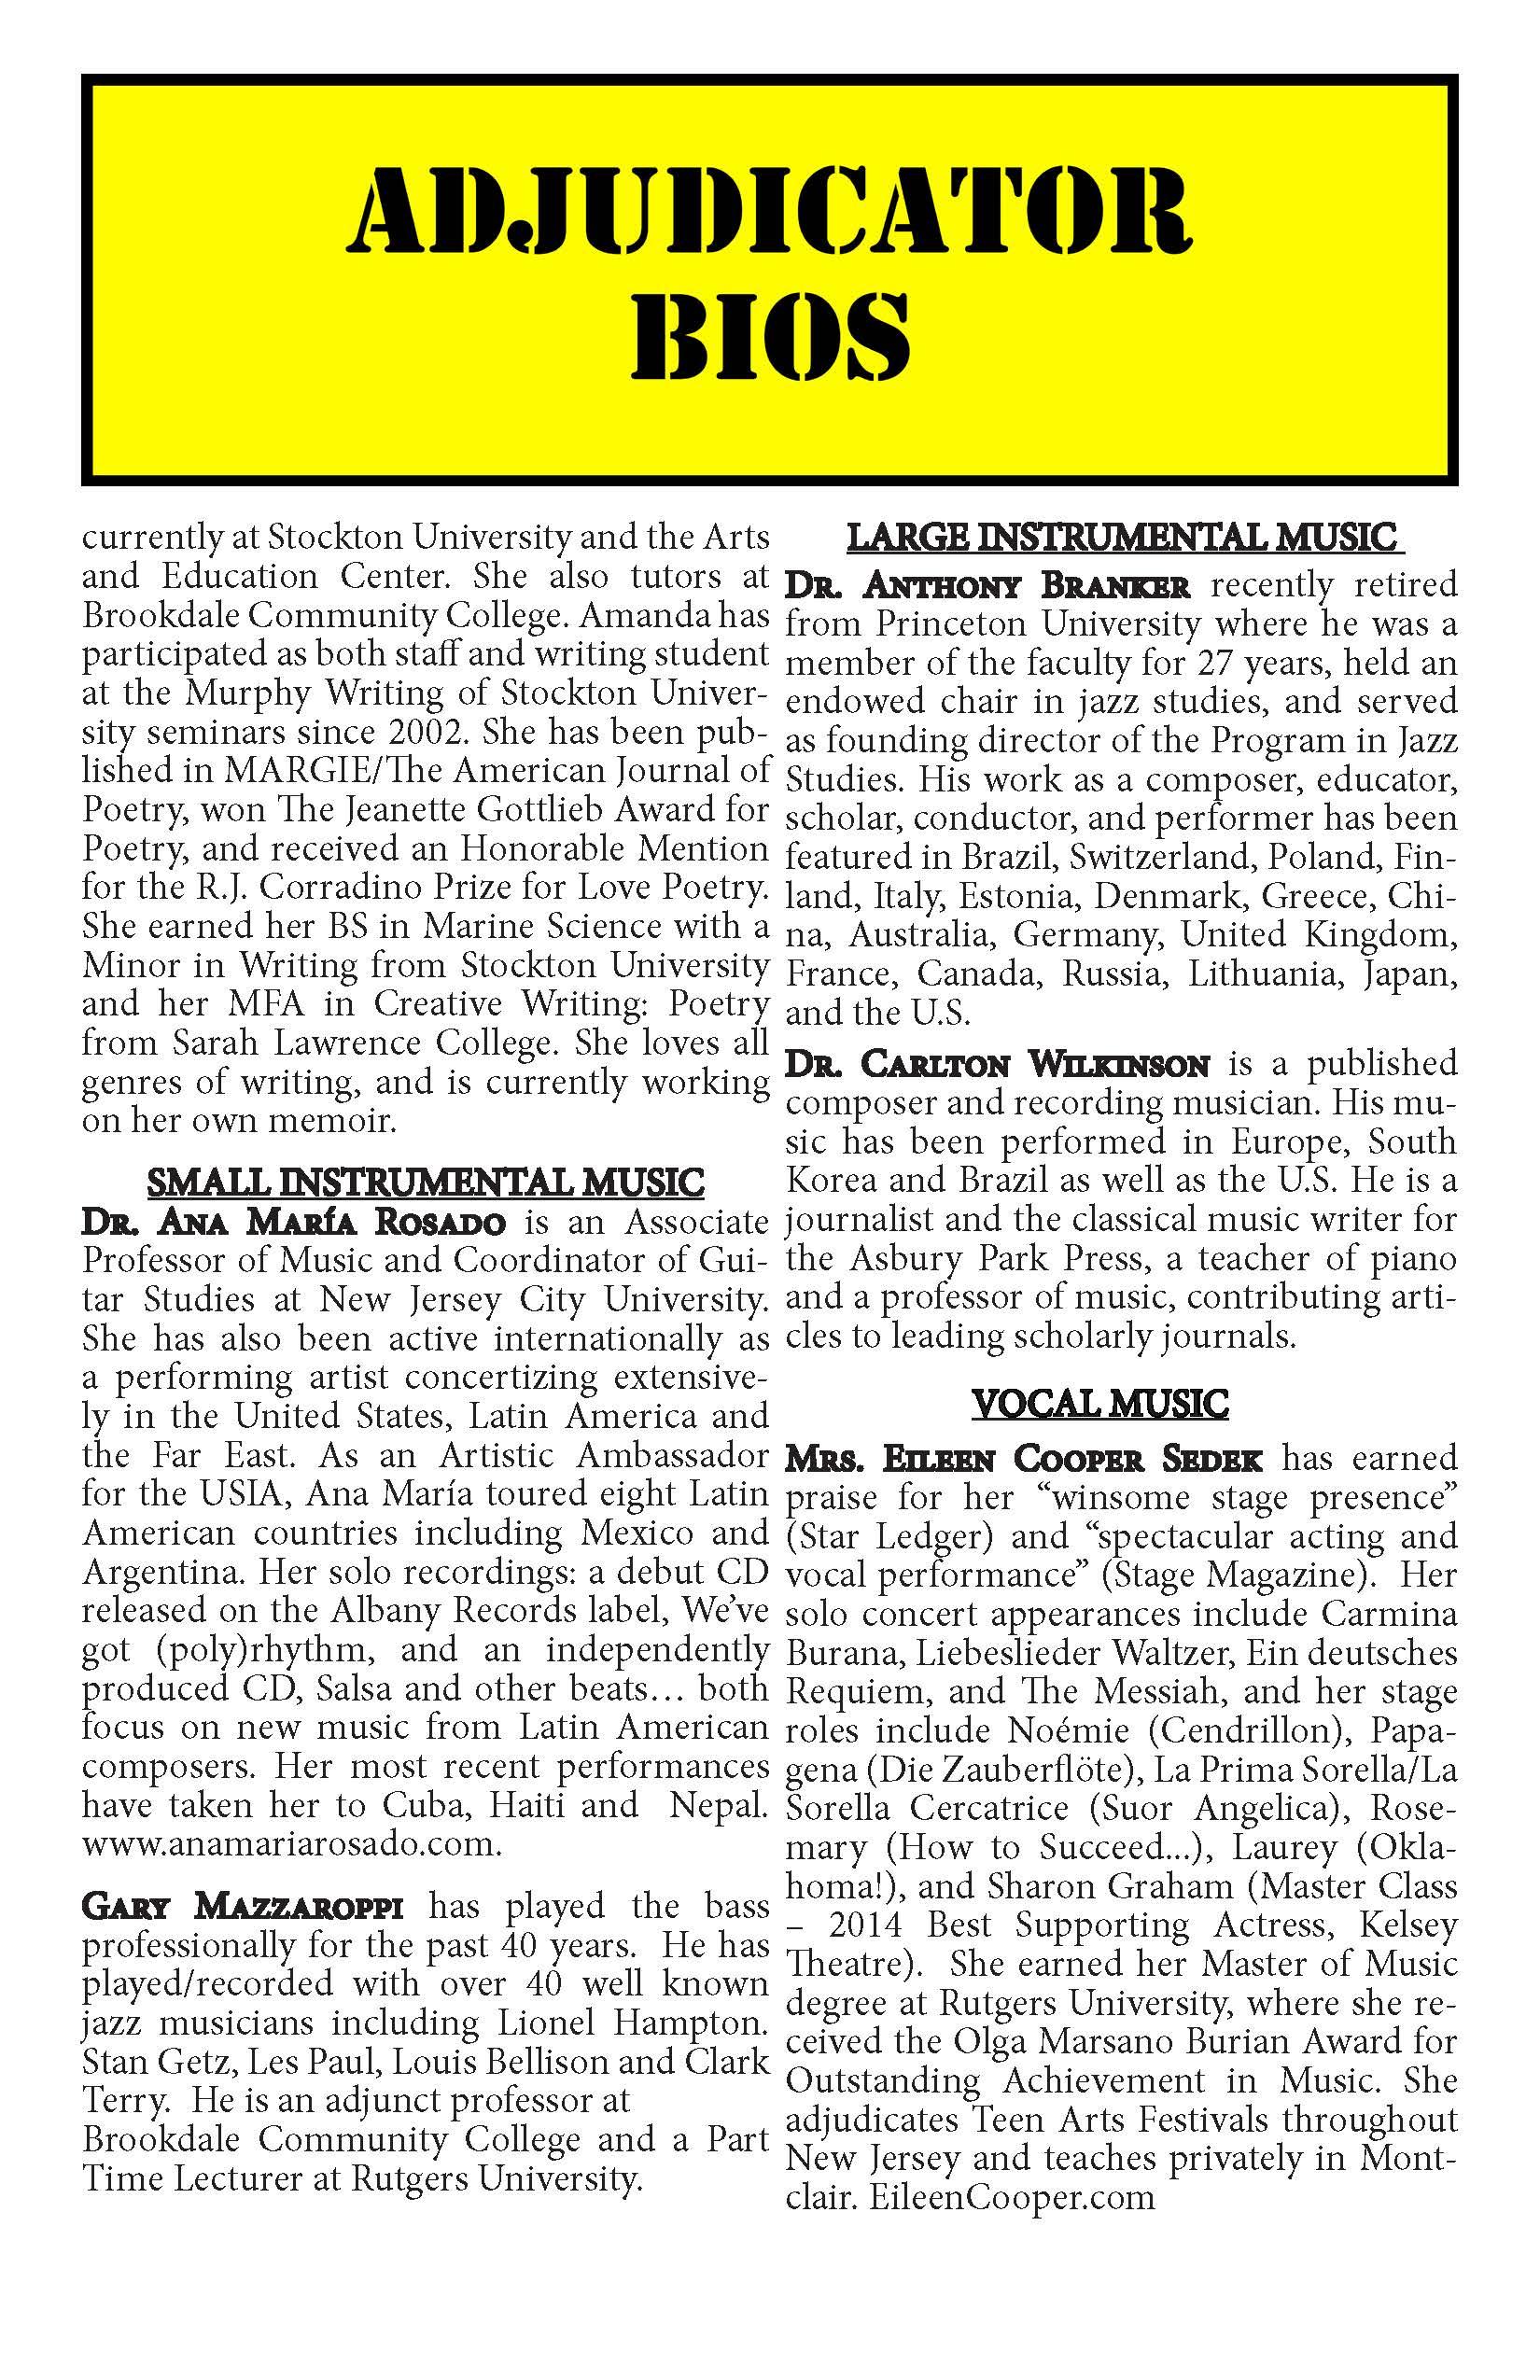 State Festival Program FINAL DRAFT_Page_23.jpg